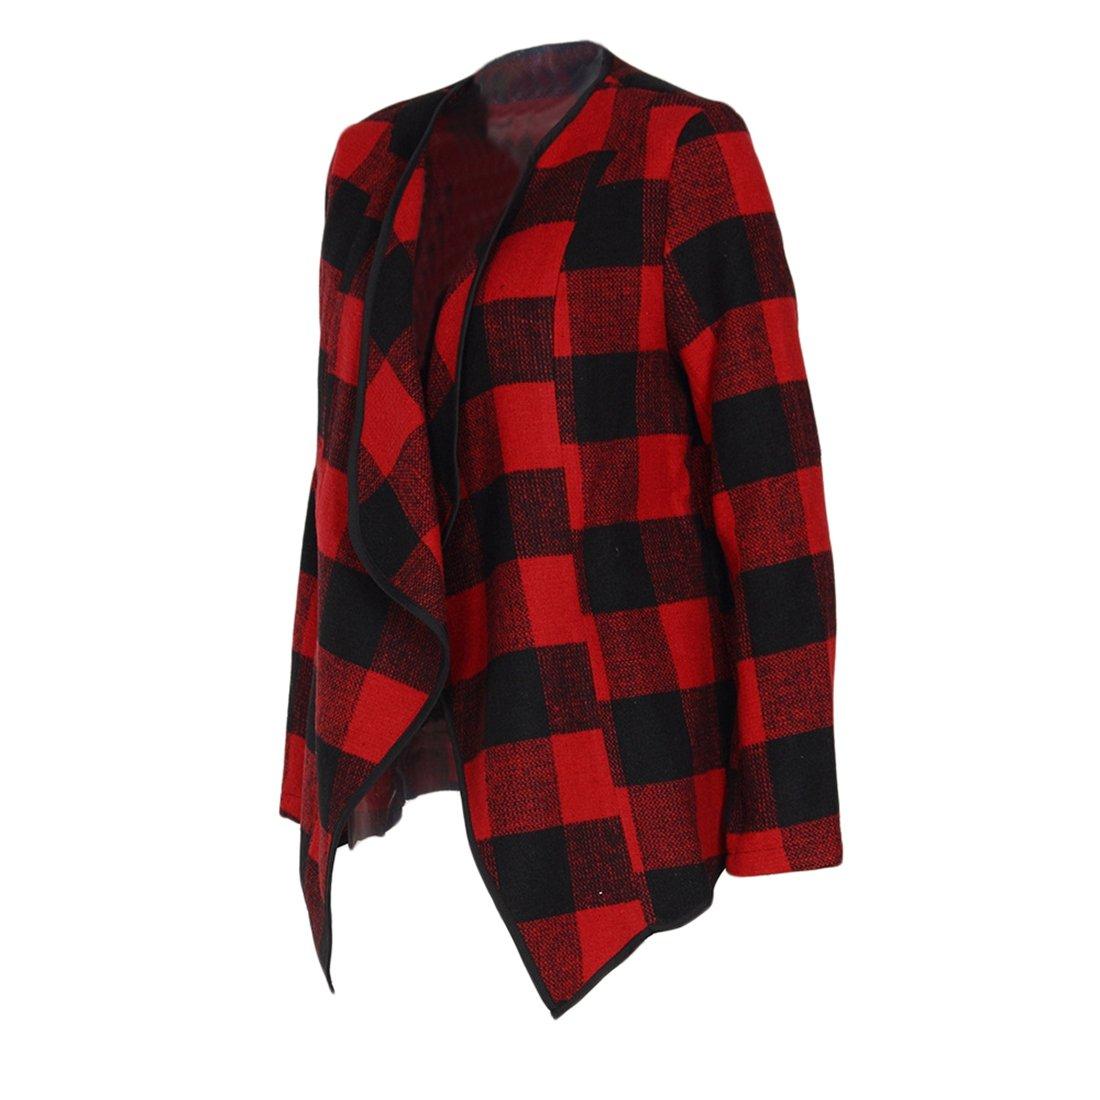 Shinekoo Women Cardigan Jacket Checked Plaid Open Front Coat Outwear by Shinekoo (Image #4)